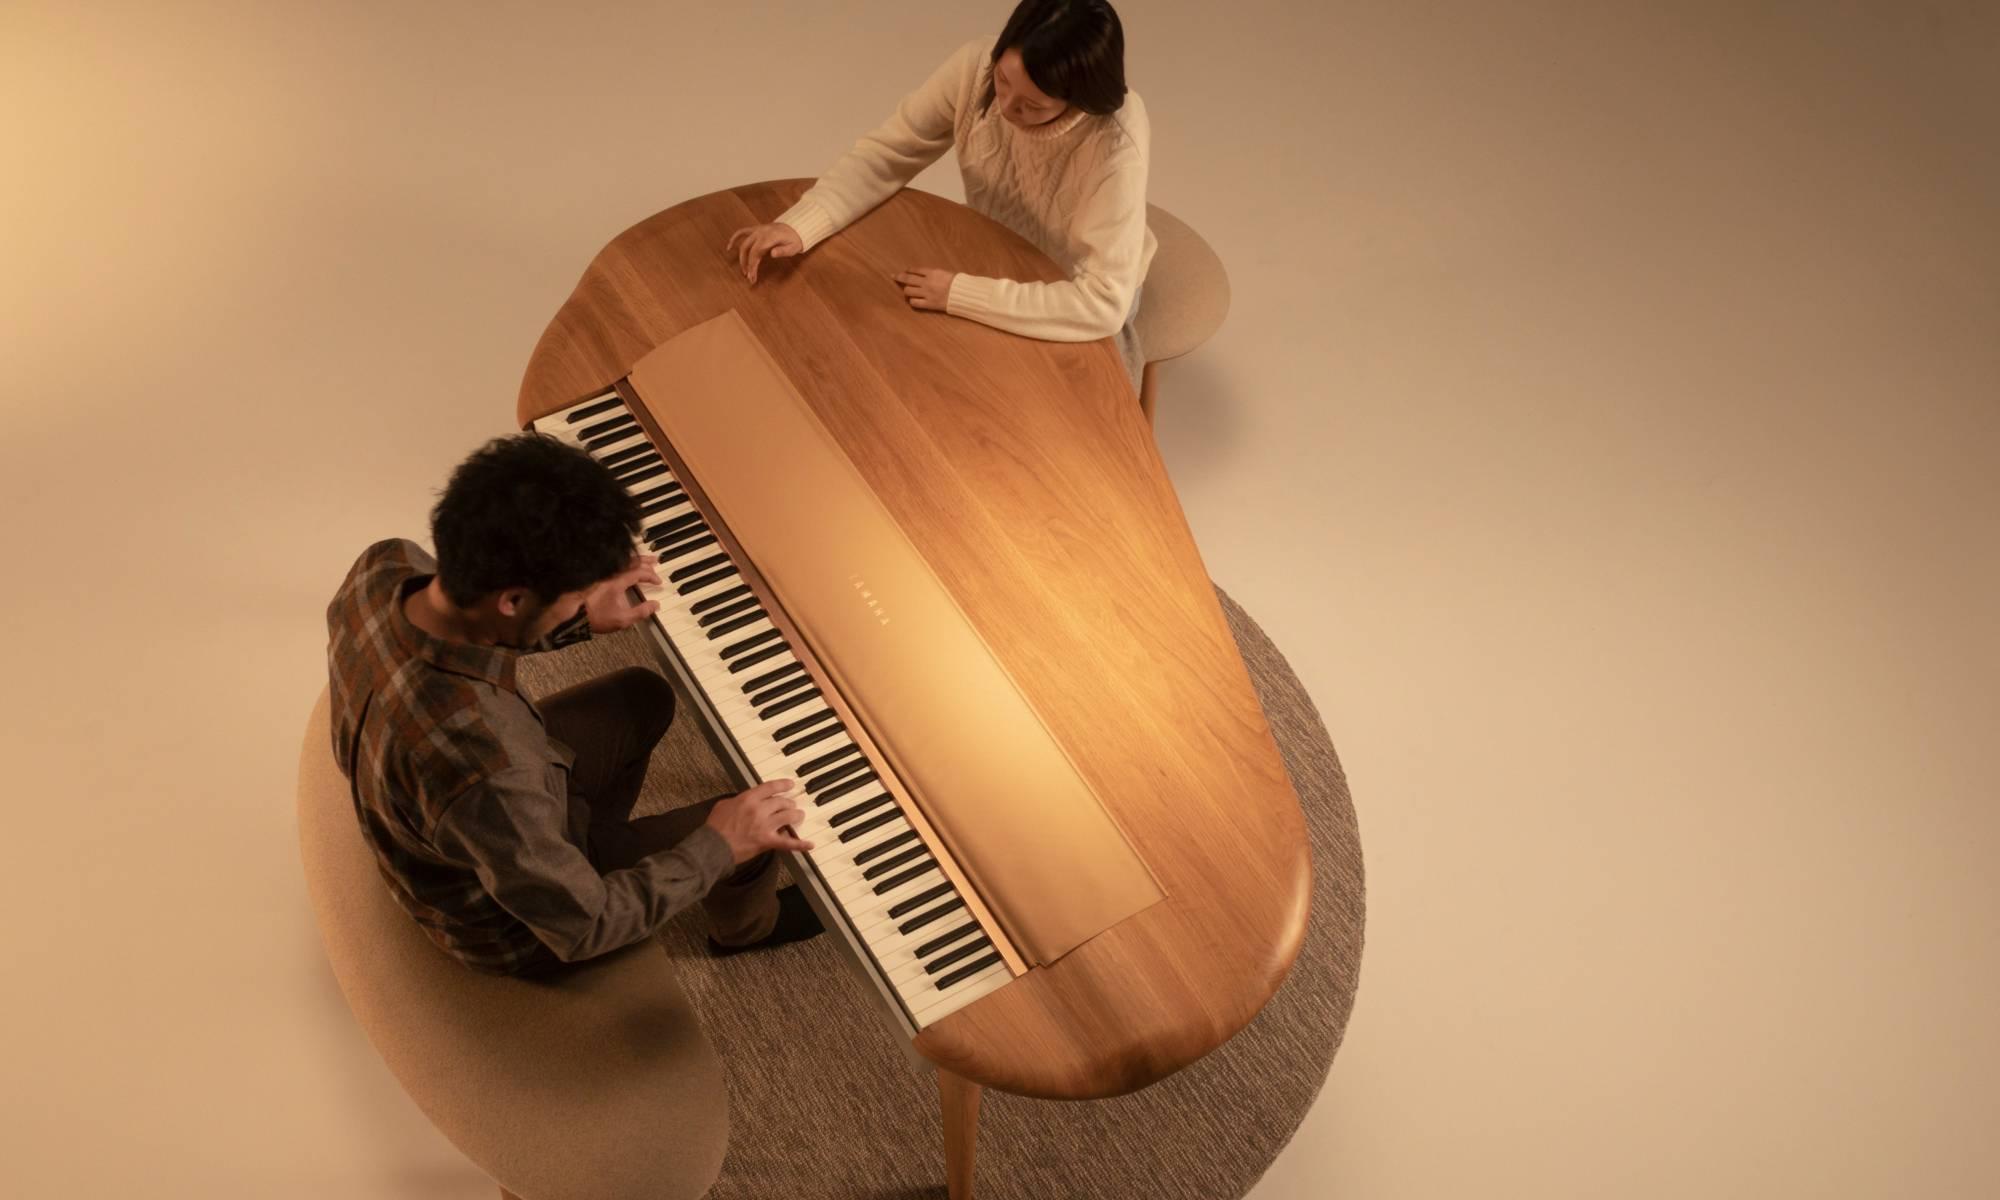 YAMAHA联手Mexarts打造全新钢琴,让家人亲情距离更近